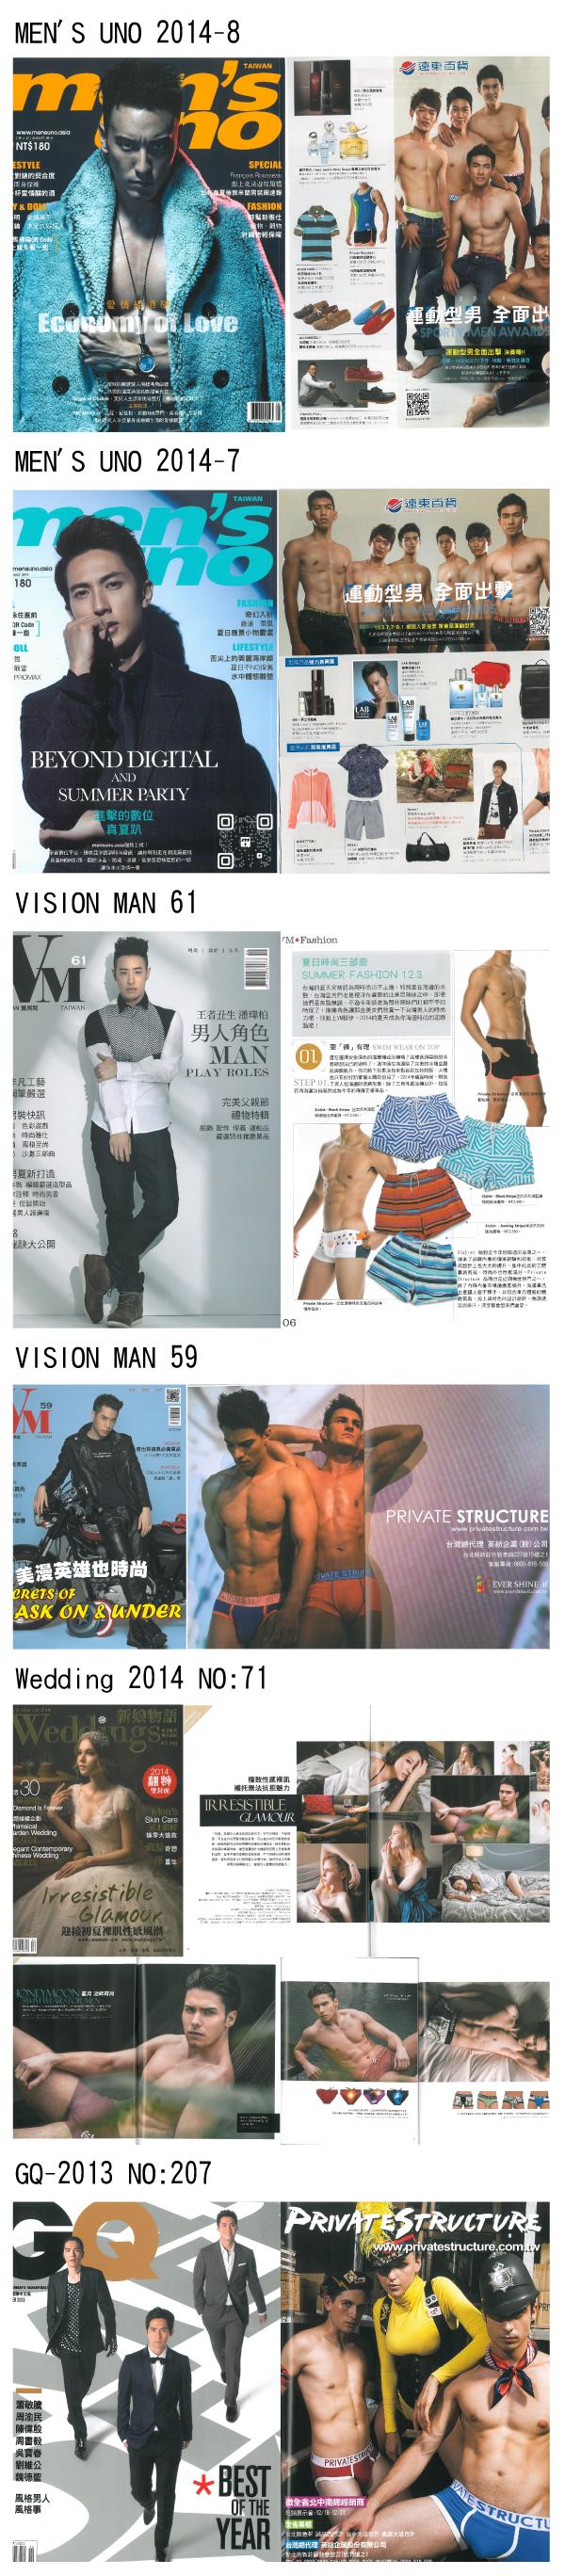 http://www.momoshop.com.tw/expertimg/0003/731/608/ps-magazine.jpg?t=1448562870